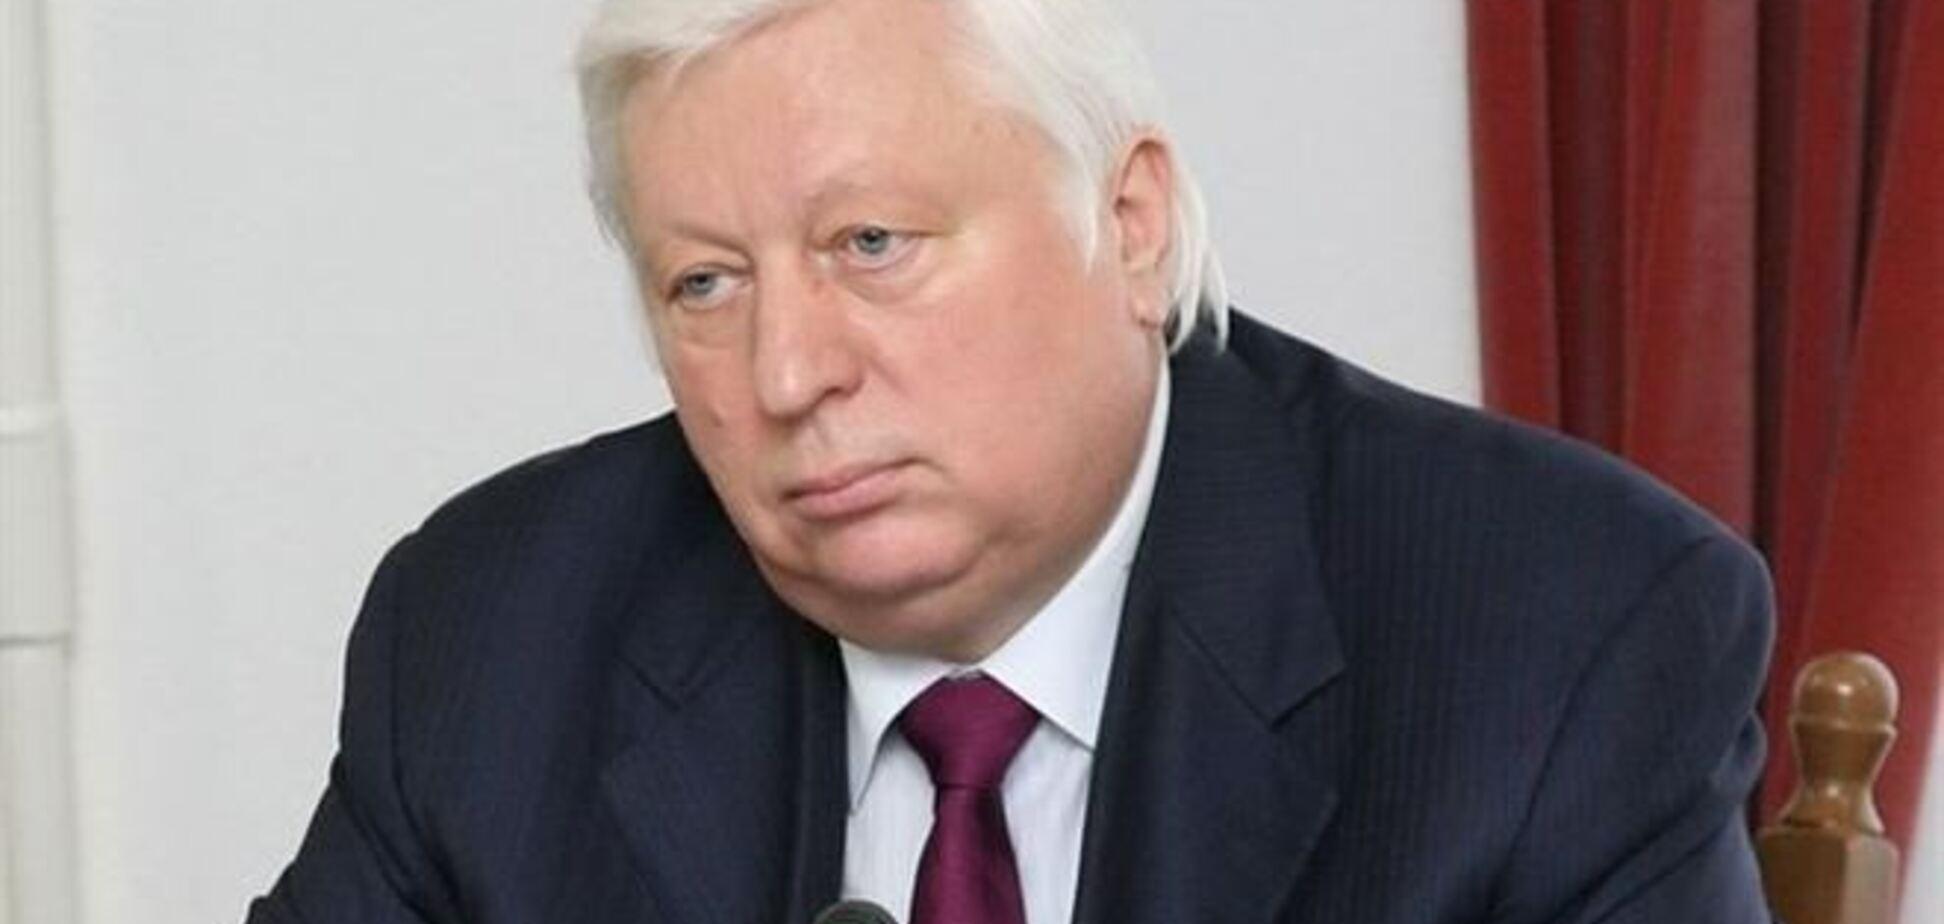 Протестующие сорвали встречу Пшонки с генсеком Совета Европы